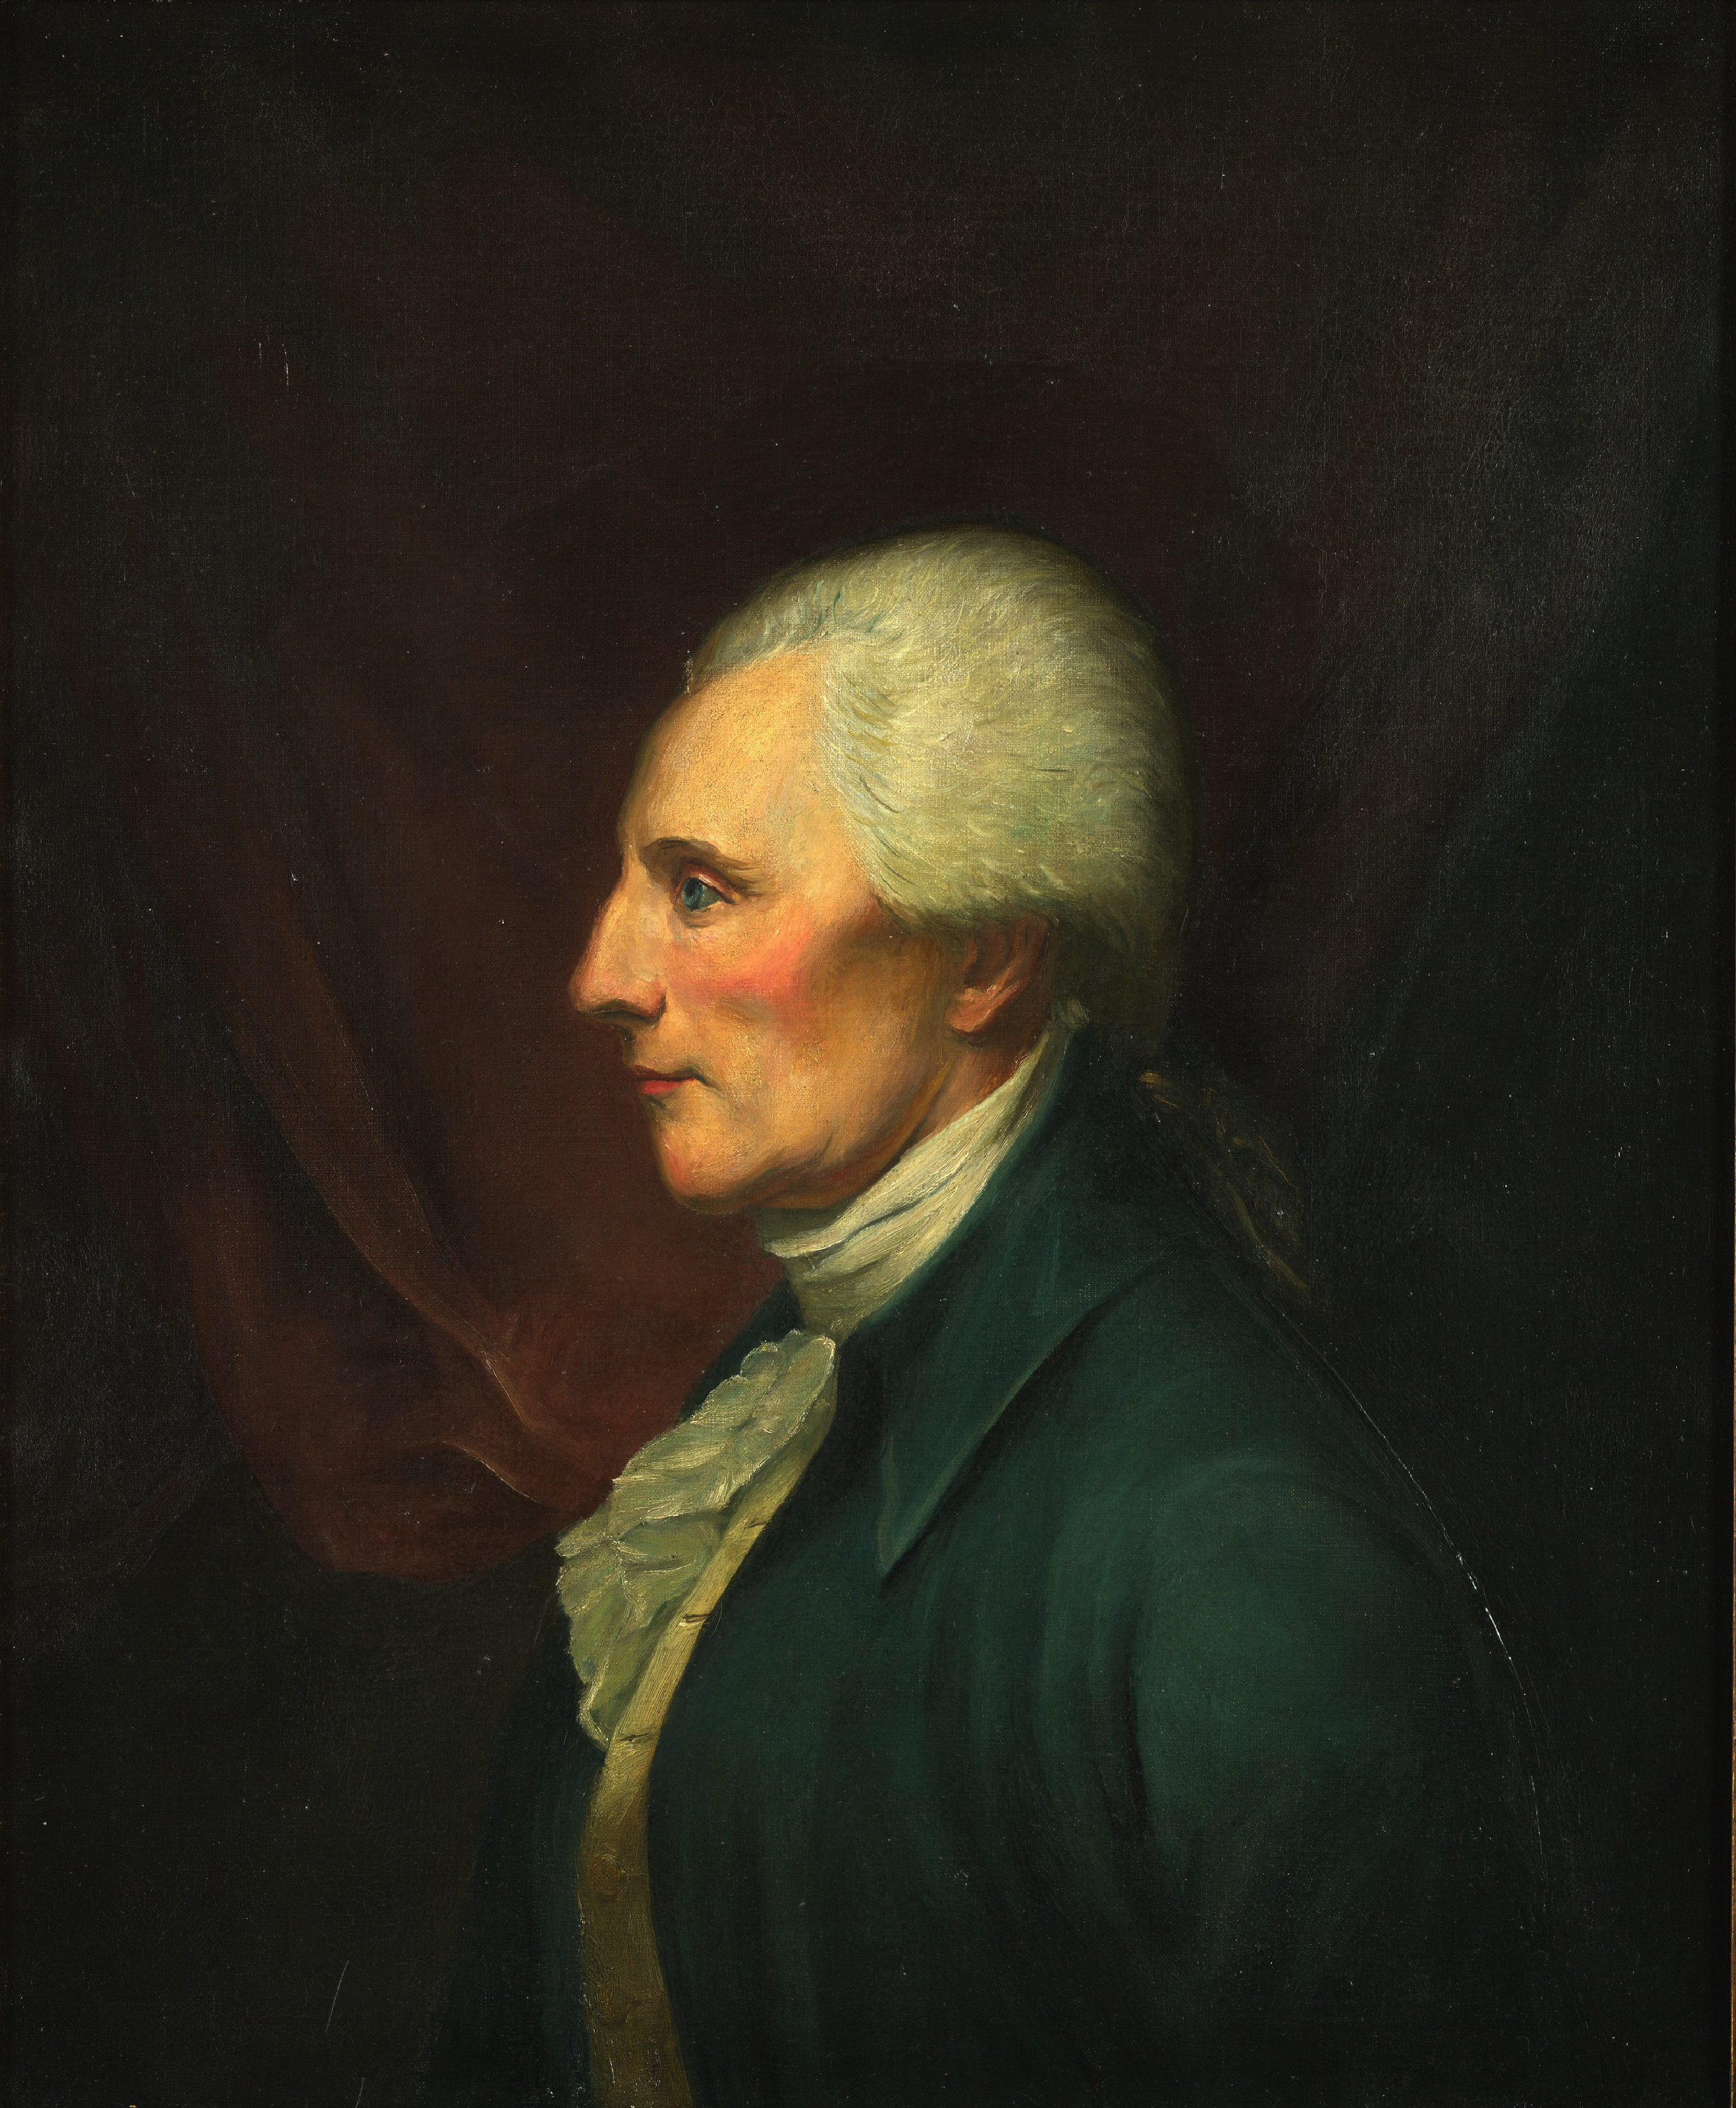 Portrait of Lee by [[Charles Willson Peale]]